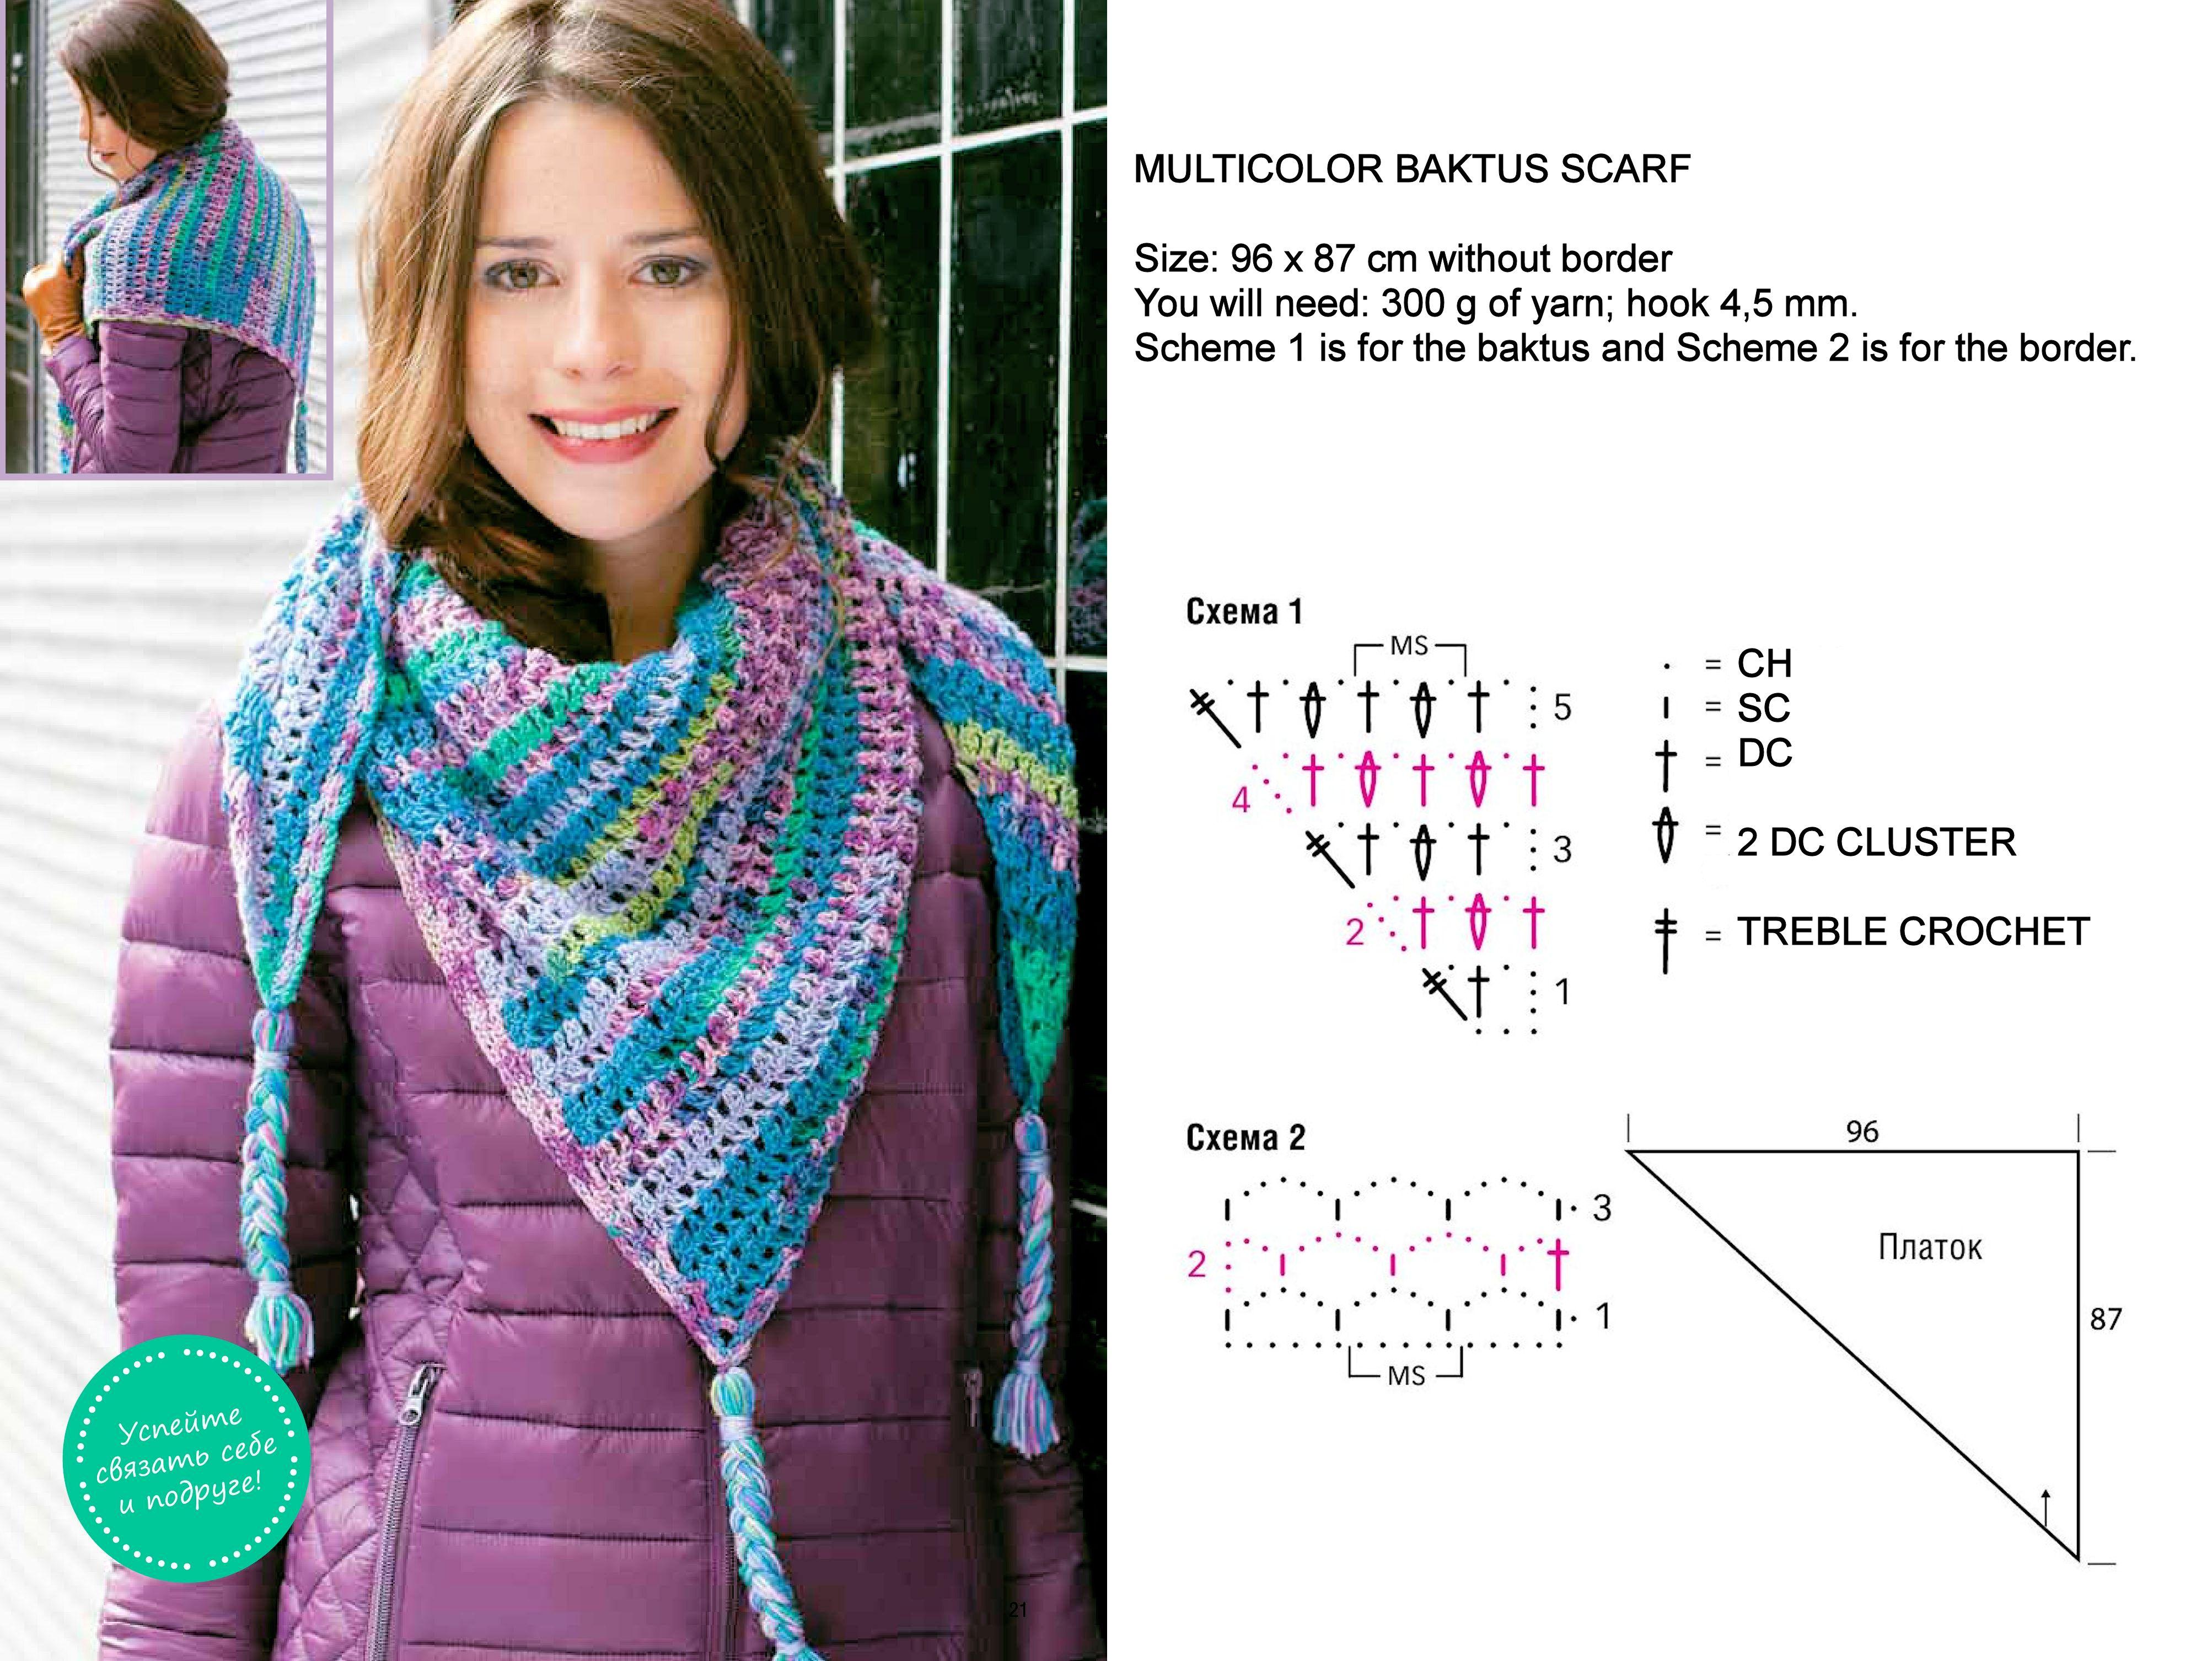 Crochet Multicolor Baktus Scarf | crochet: shawls & scarves 2 ...